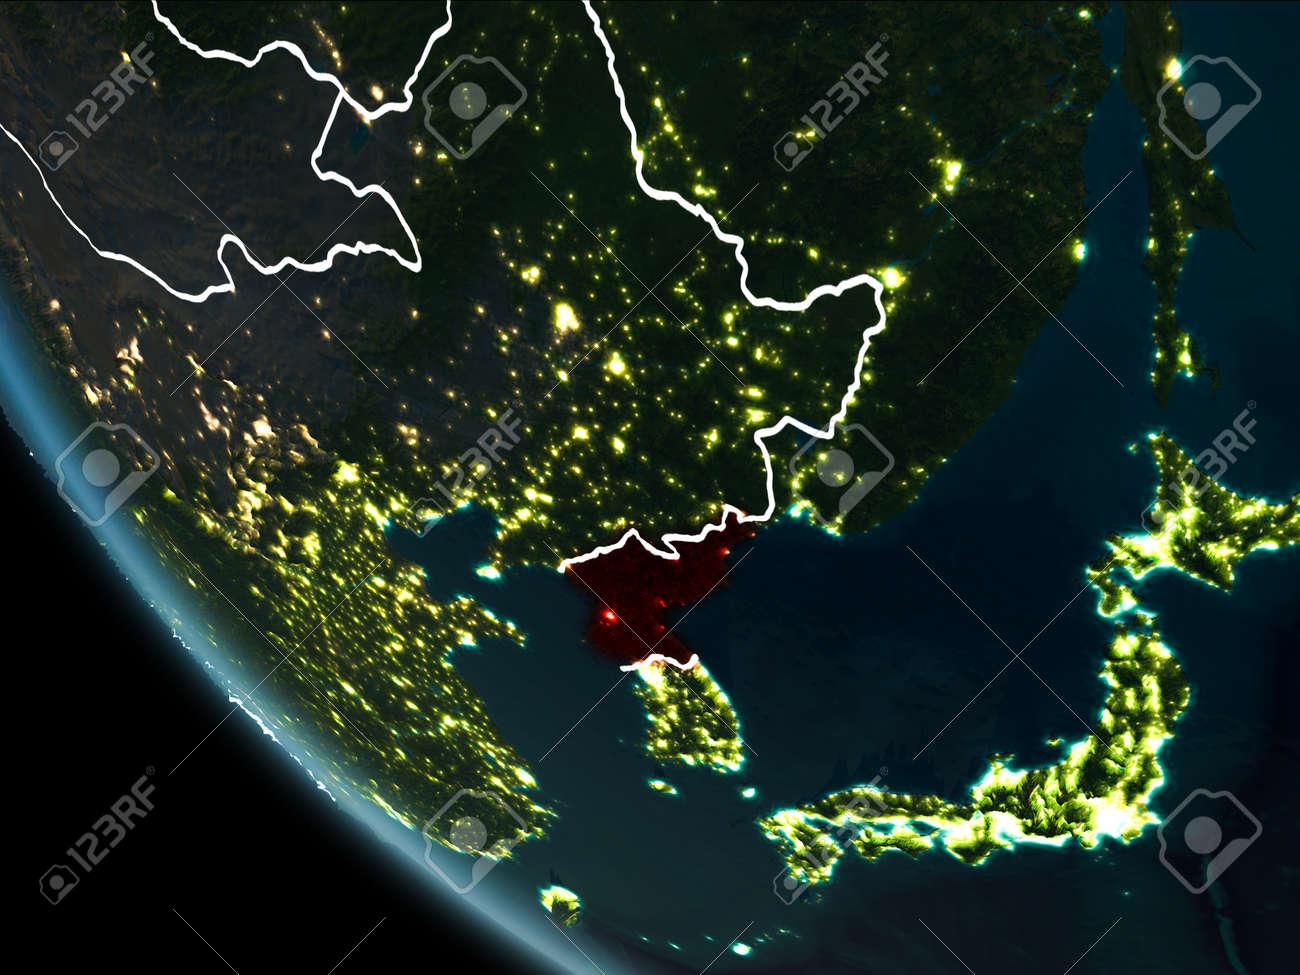 Stock Illustration on map of saudi arabia satellite, map of sri lanka satellite, map of greenland satellite, map of israel satellite, map of korean peninsula satellite, map of singapore satellite, map of pakistan satellite, map of philippines satellite,